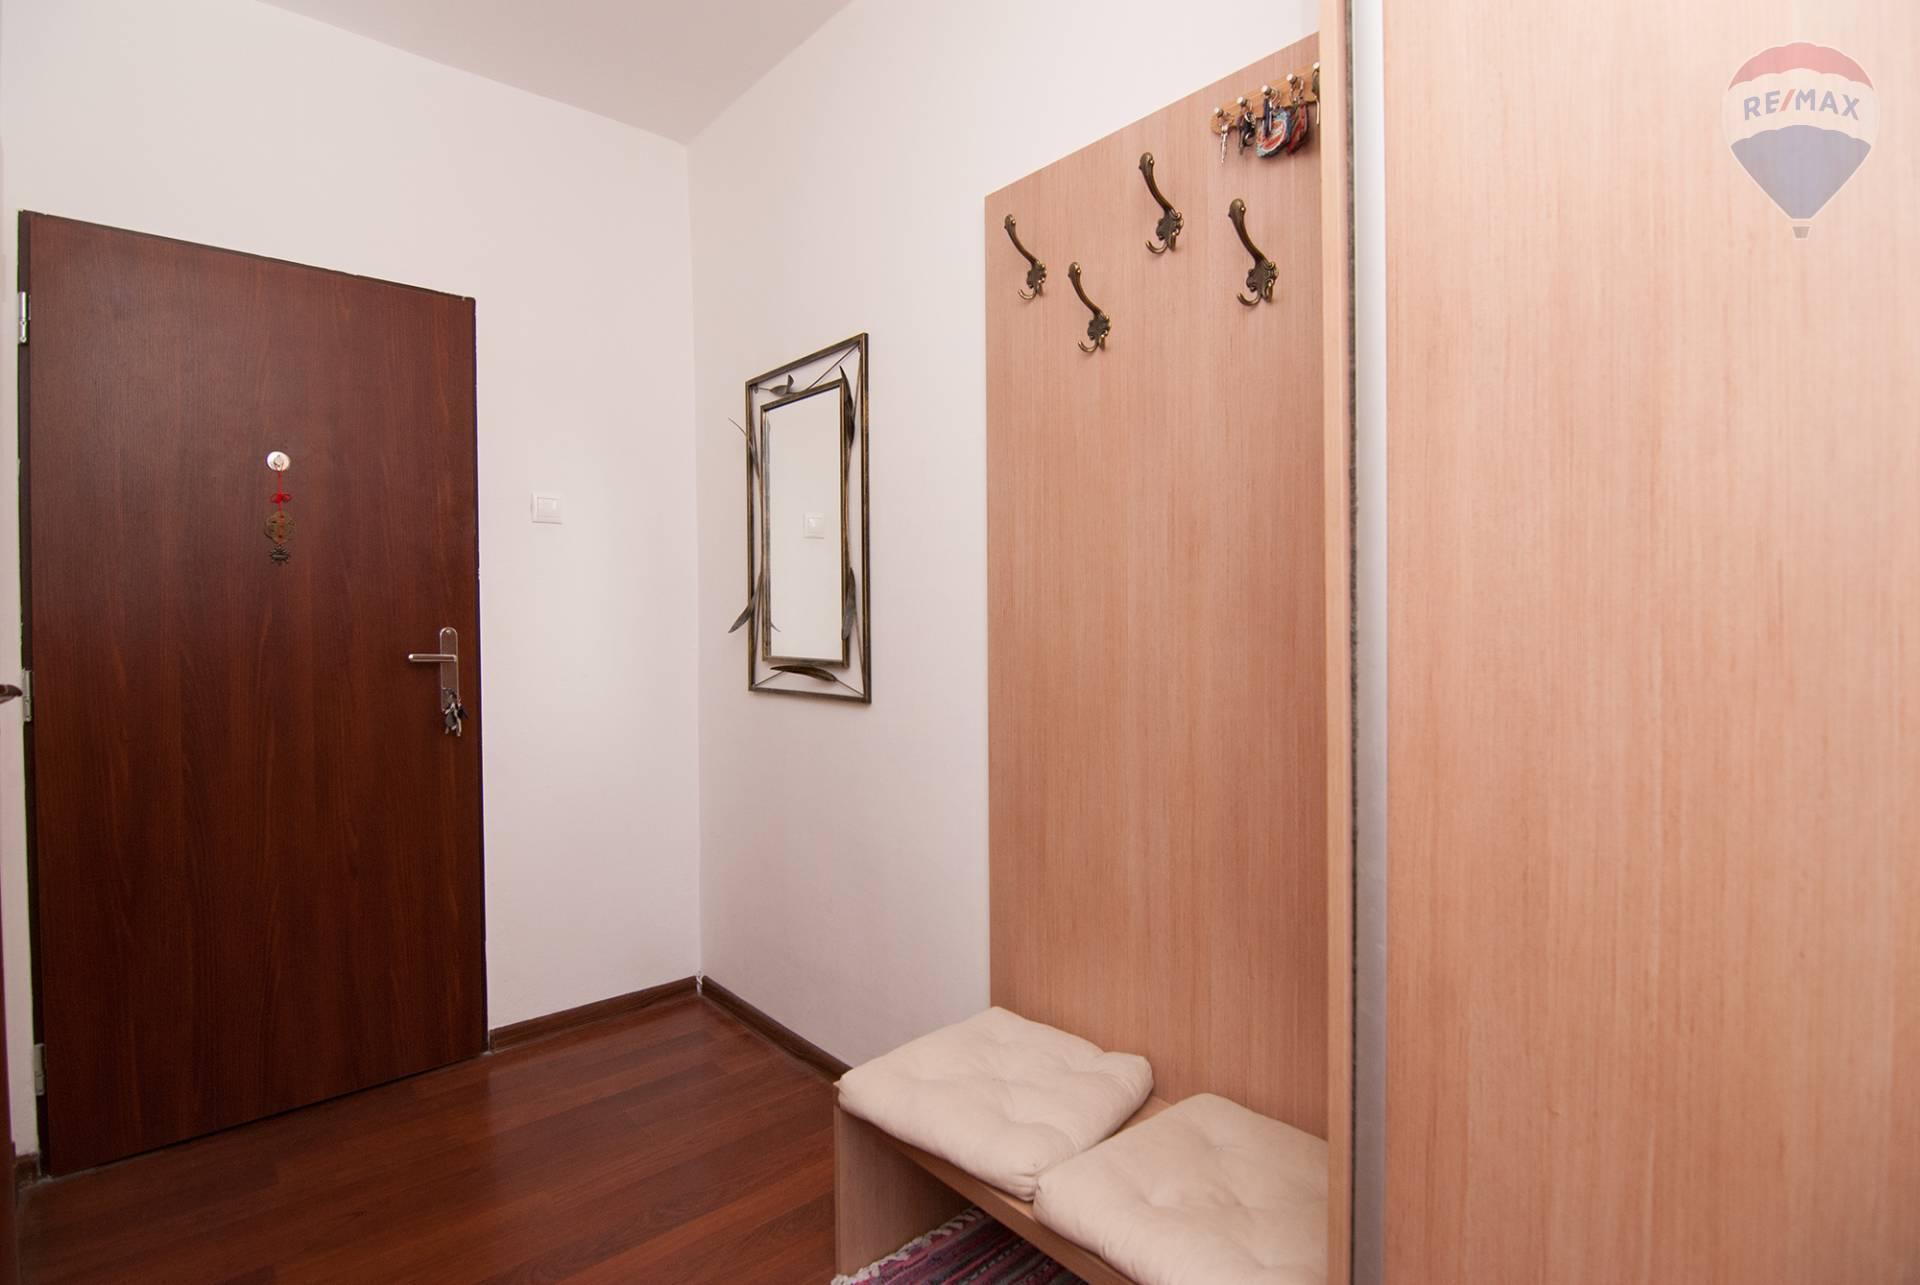 Predaj bytu (3 izbový) 70 m2, Bratislava - Podunajské Biskupice - vstupná hala